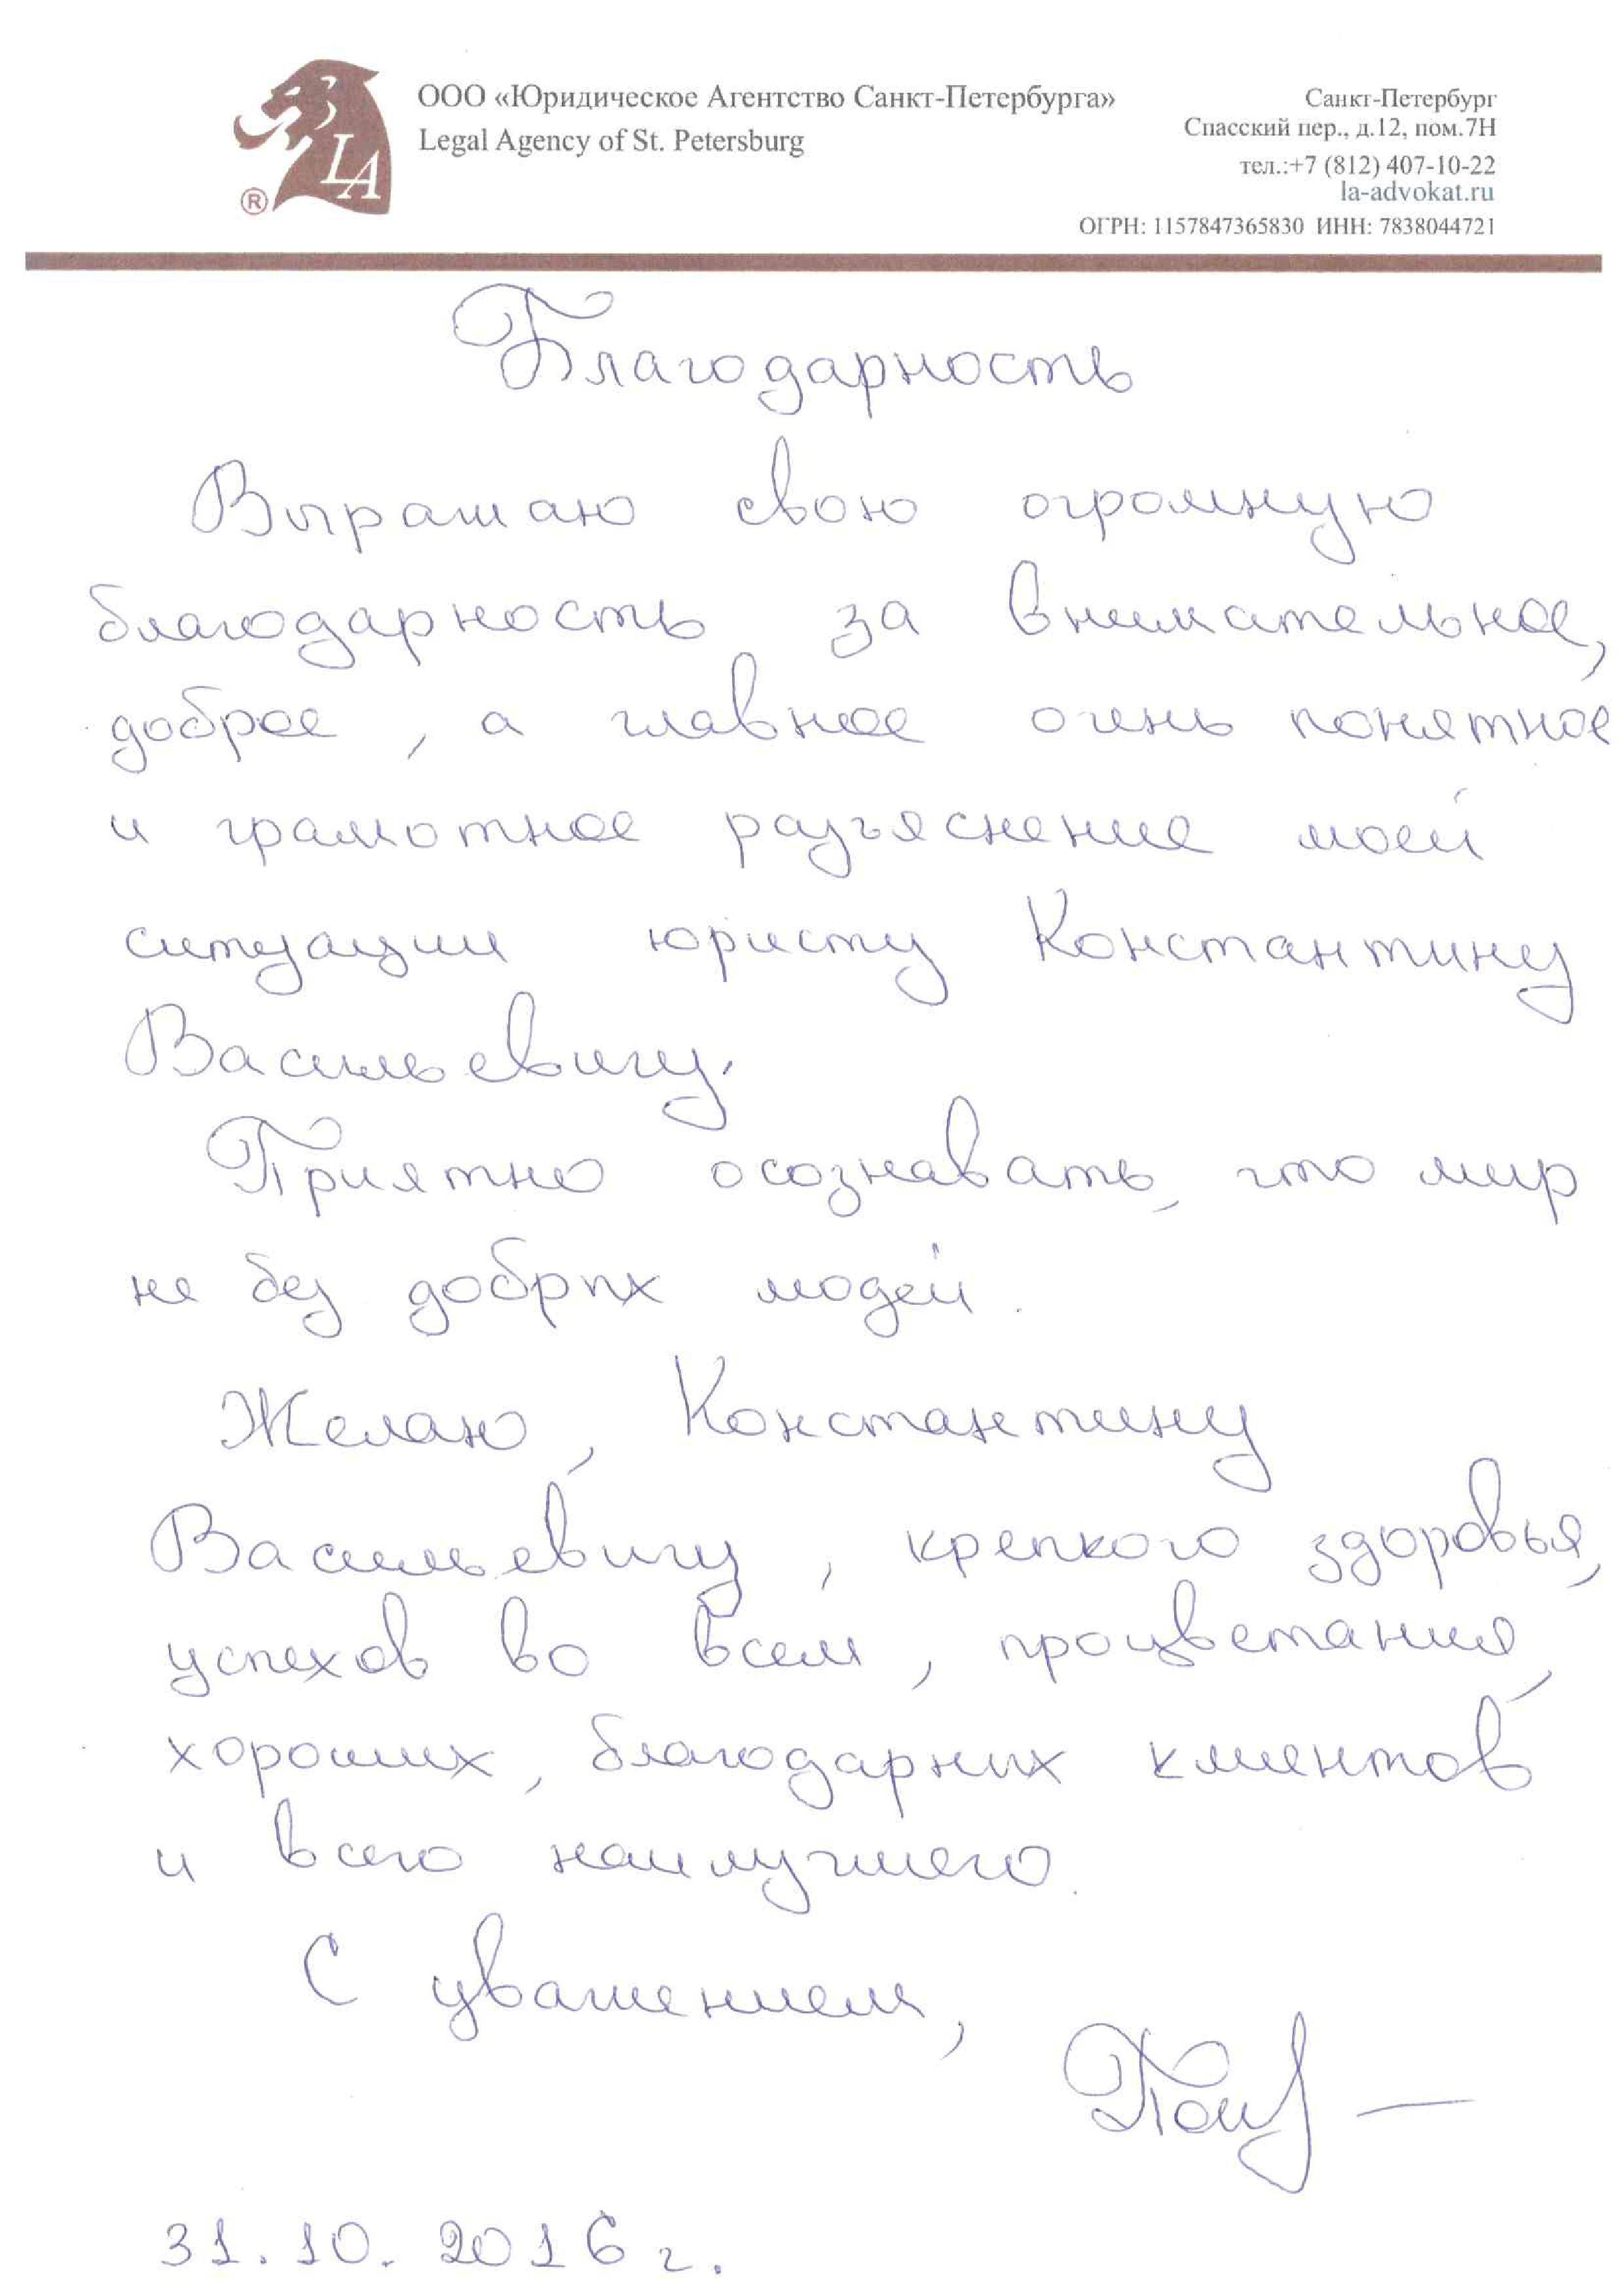 Благодарность Константину Васильевичу